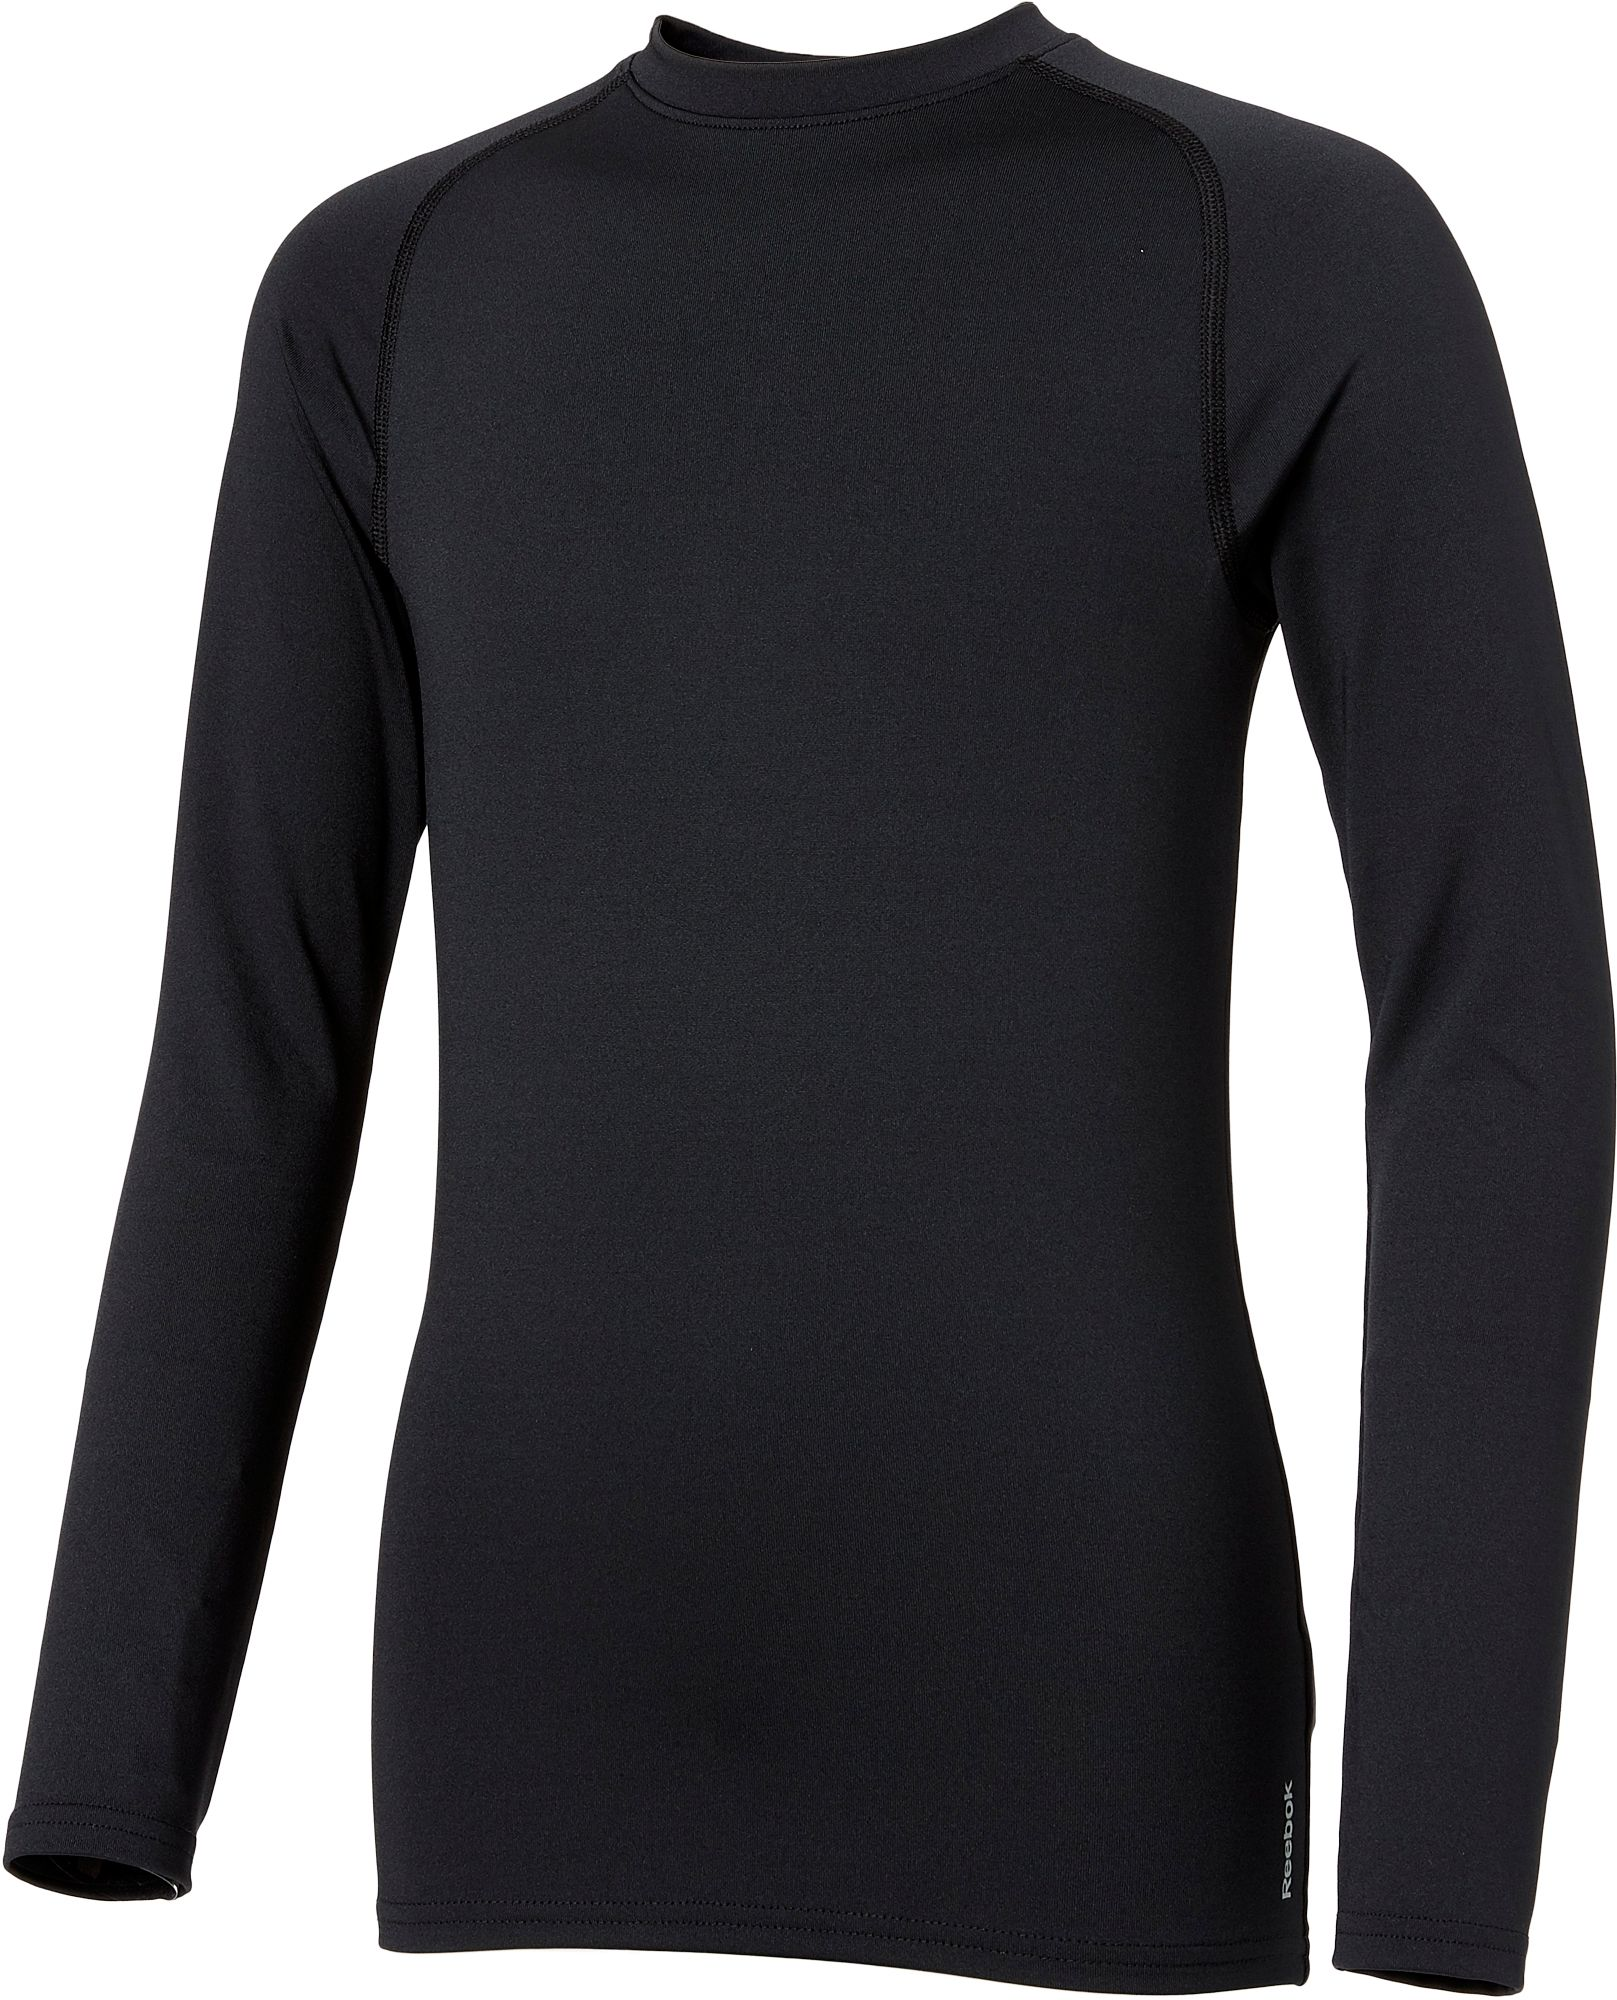 Reebok Boys' Cold Weather Compression Crewneck Long Sleeve Shirt ...